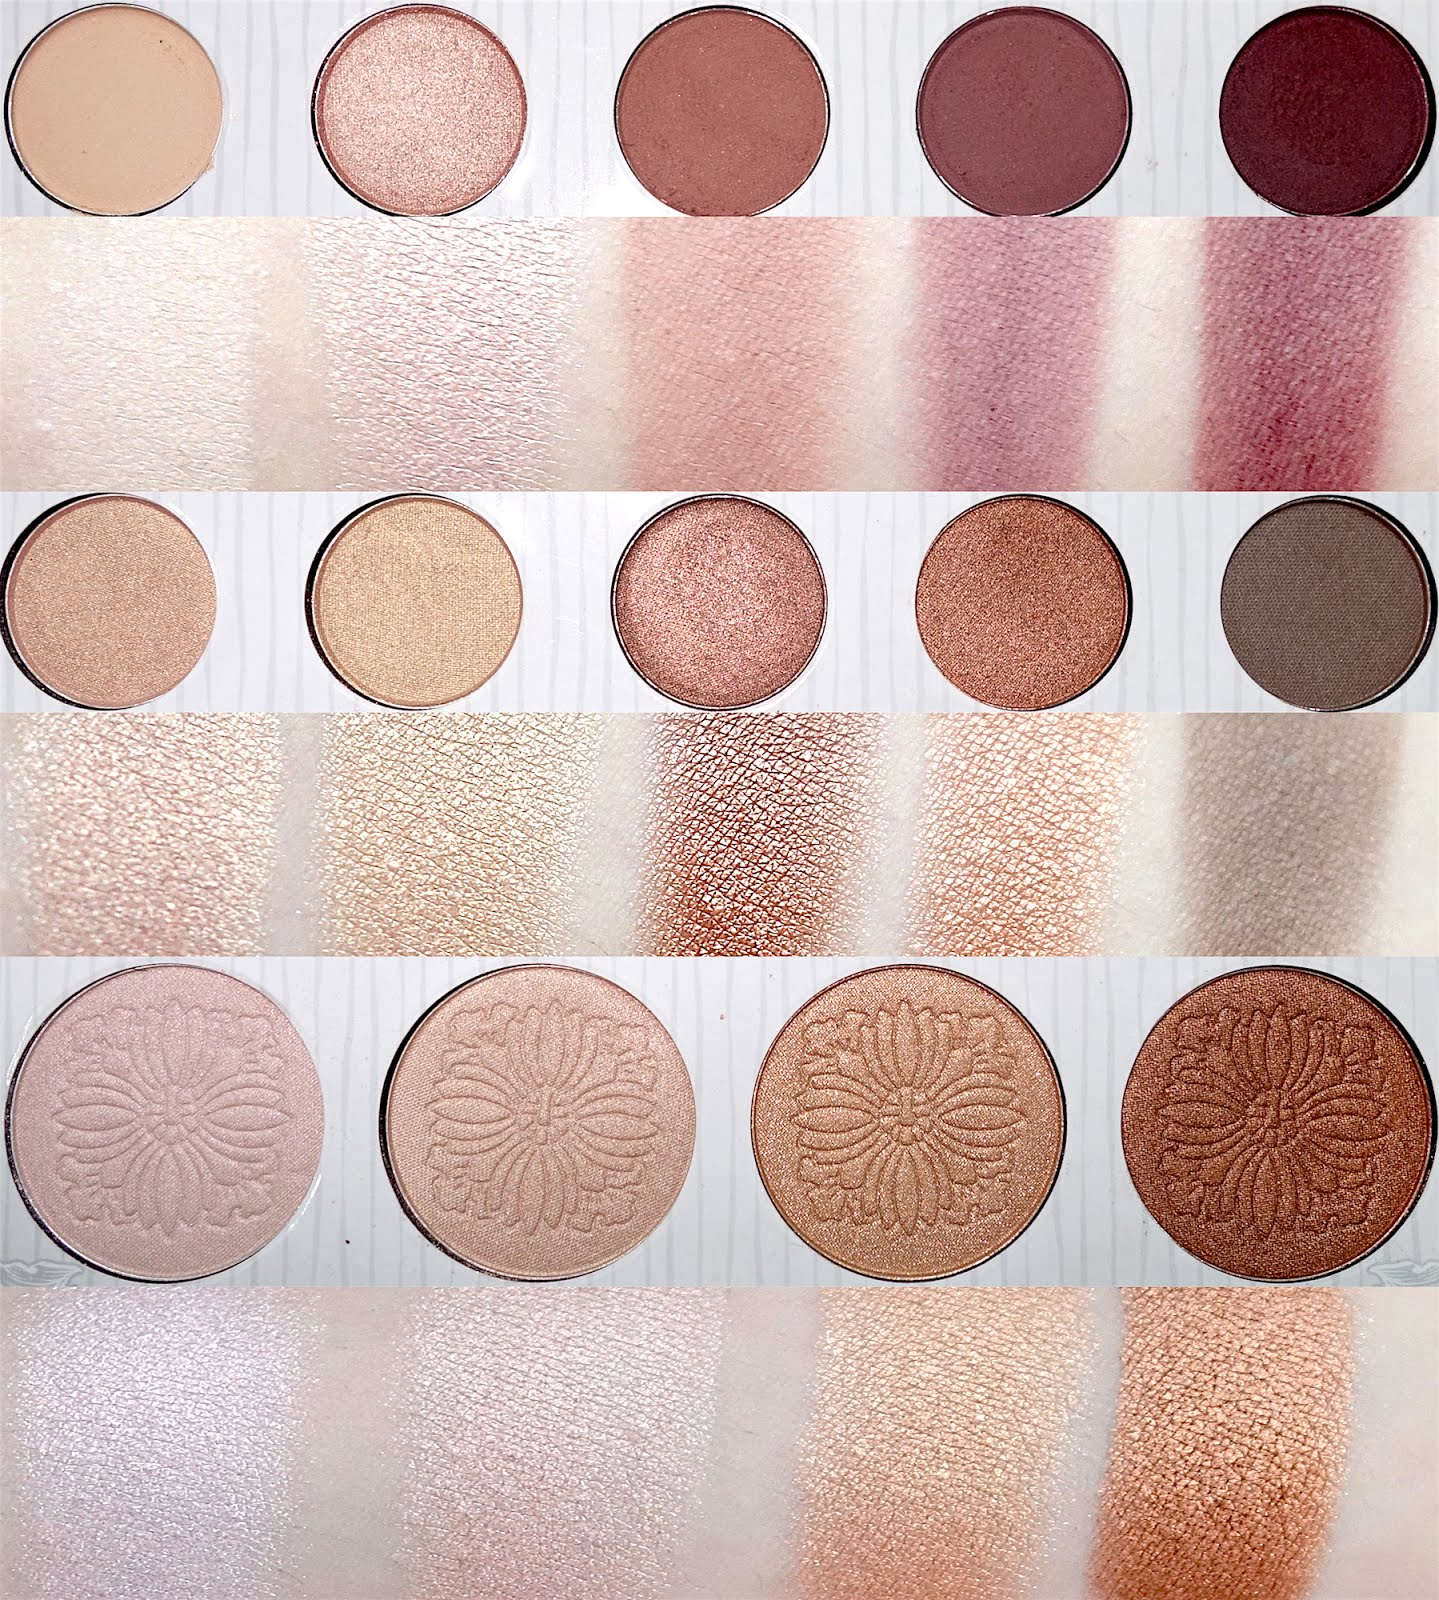 Carli Bybel X Bh Cosmetics Eyeshadow Amp Highlighter Palette